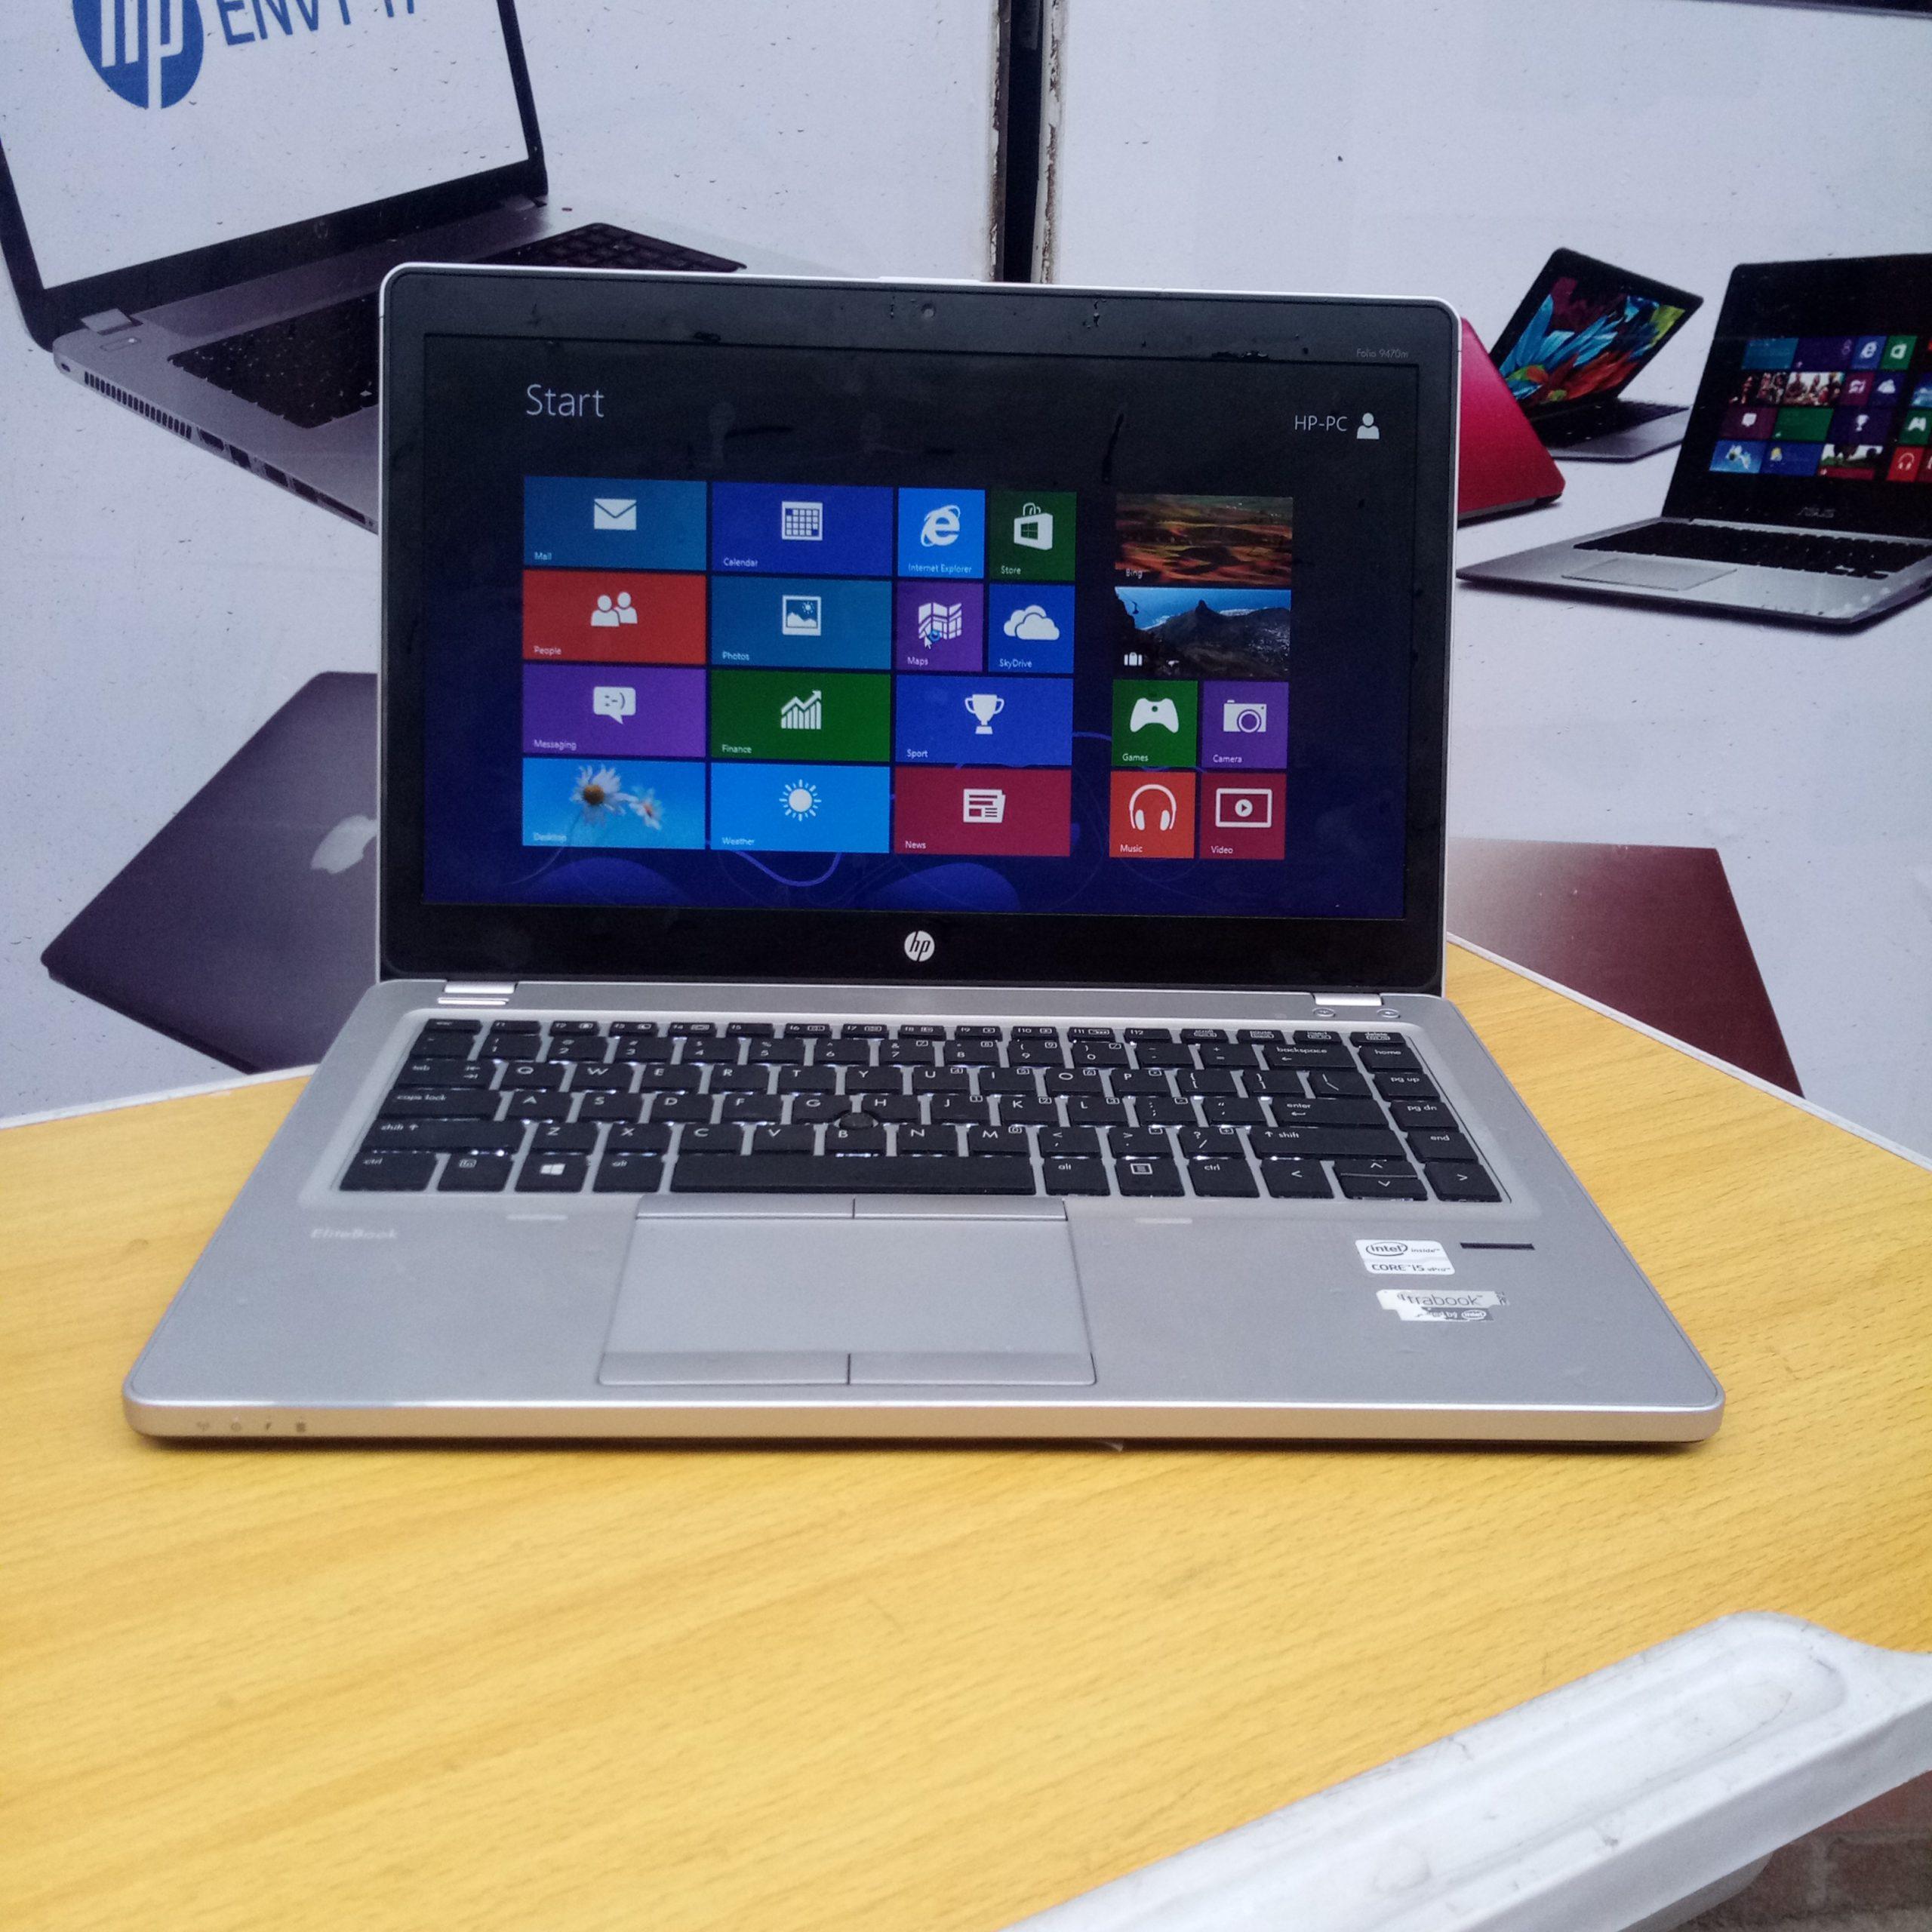 UK Used: HP Elitebook Folio Core i5, 500gb hdd 4gb Ram, Keyboard Light and Fingerprint